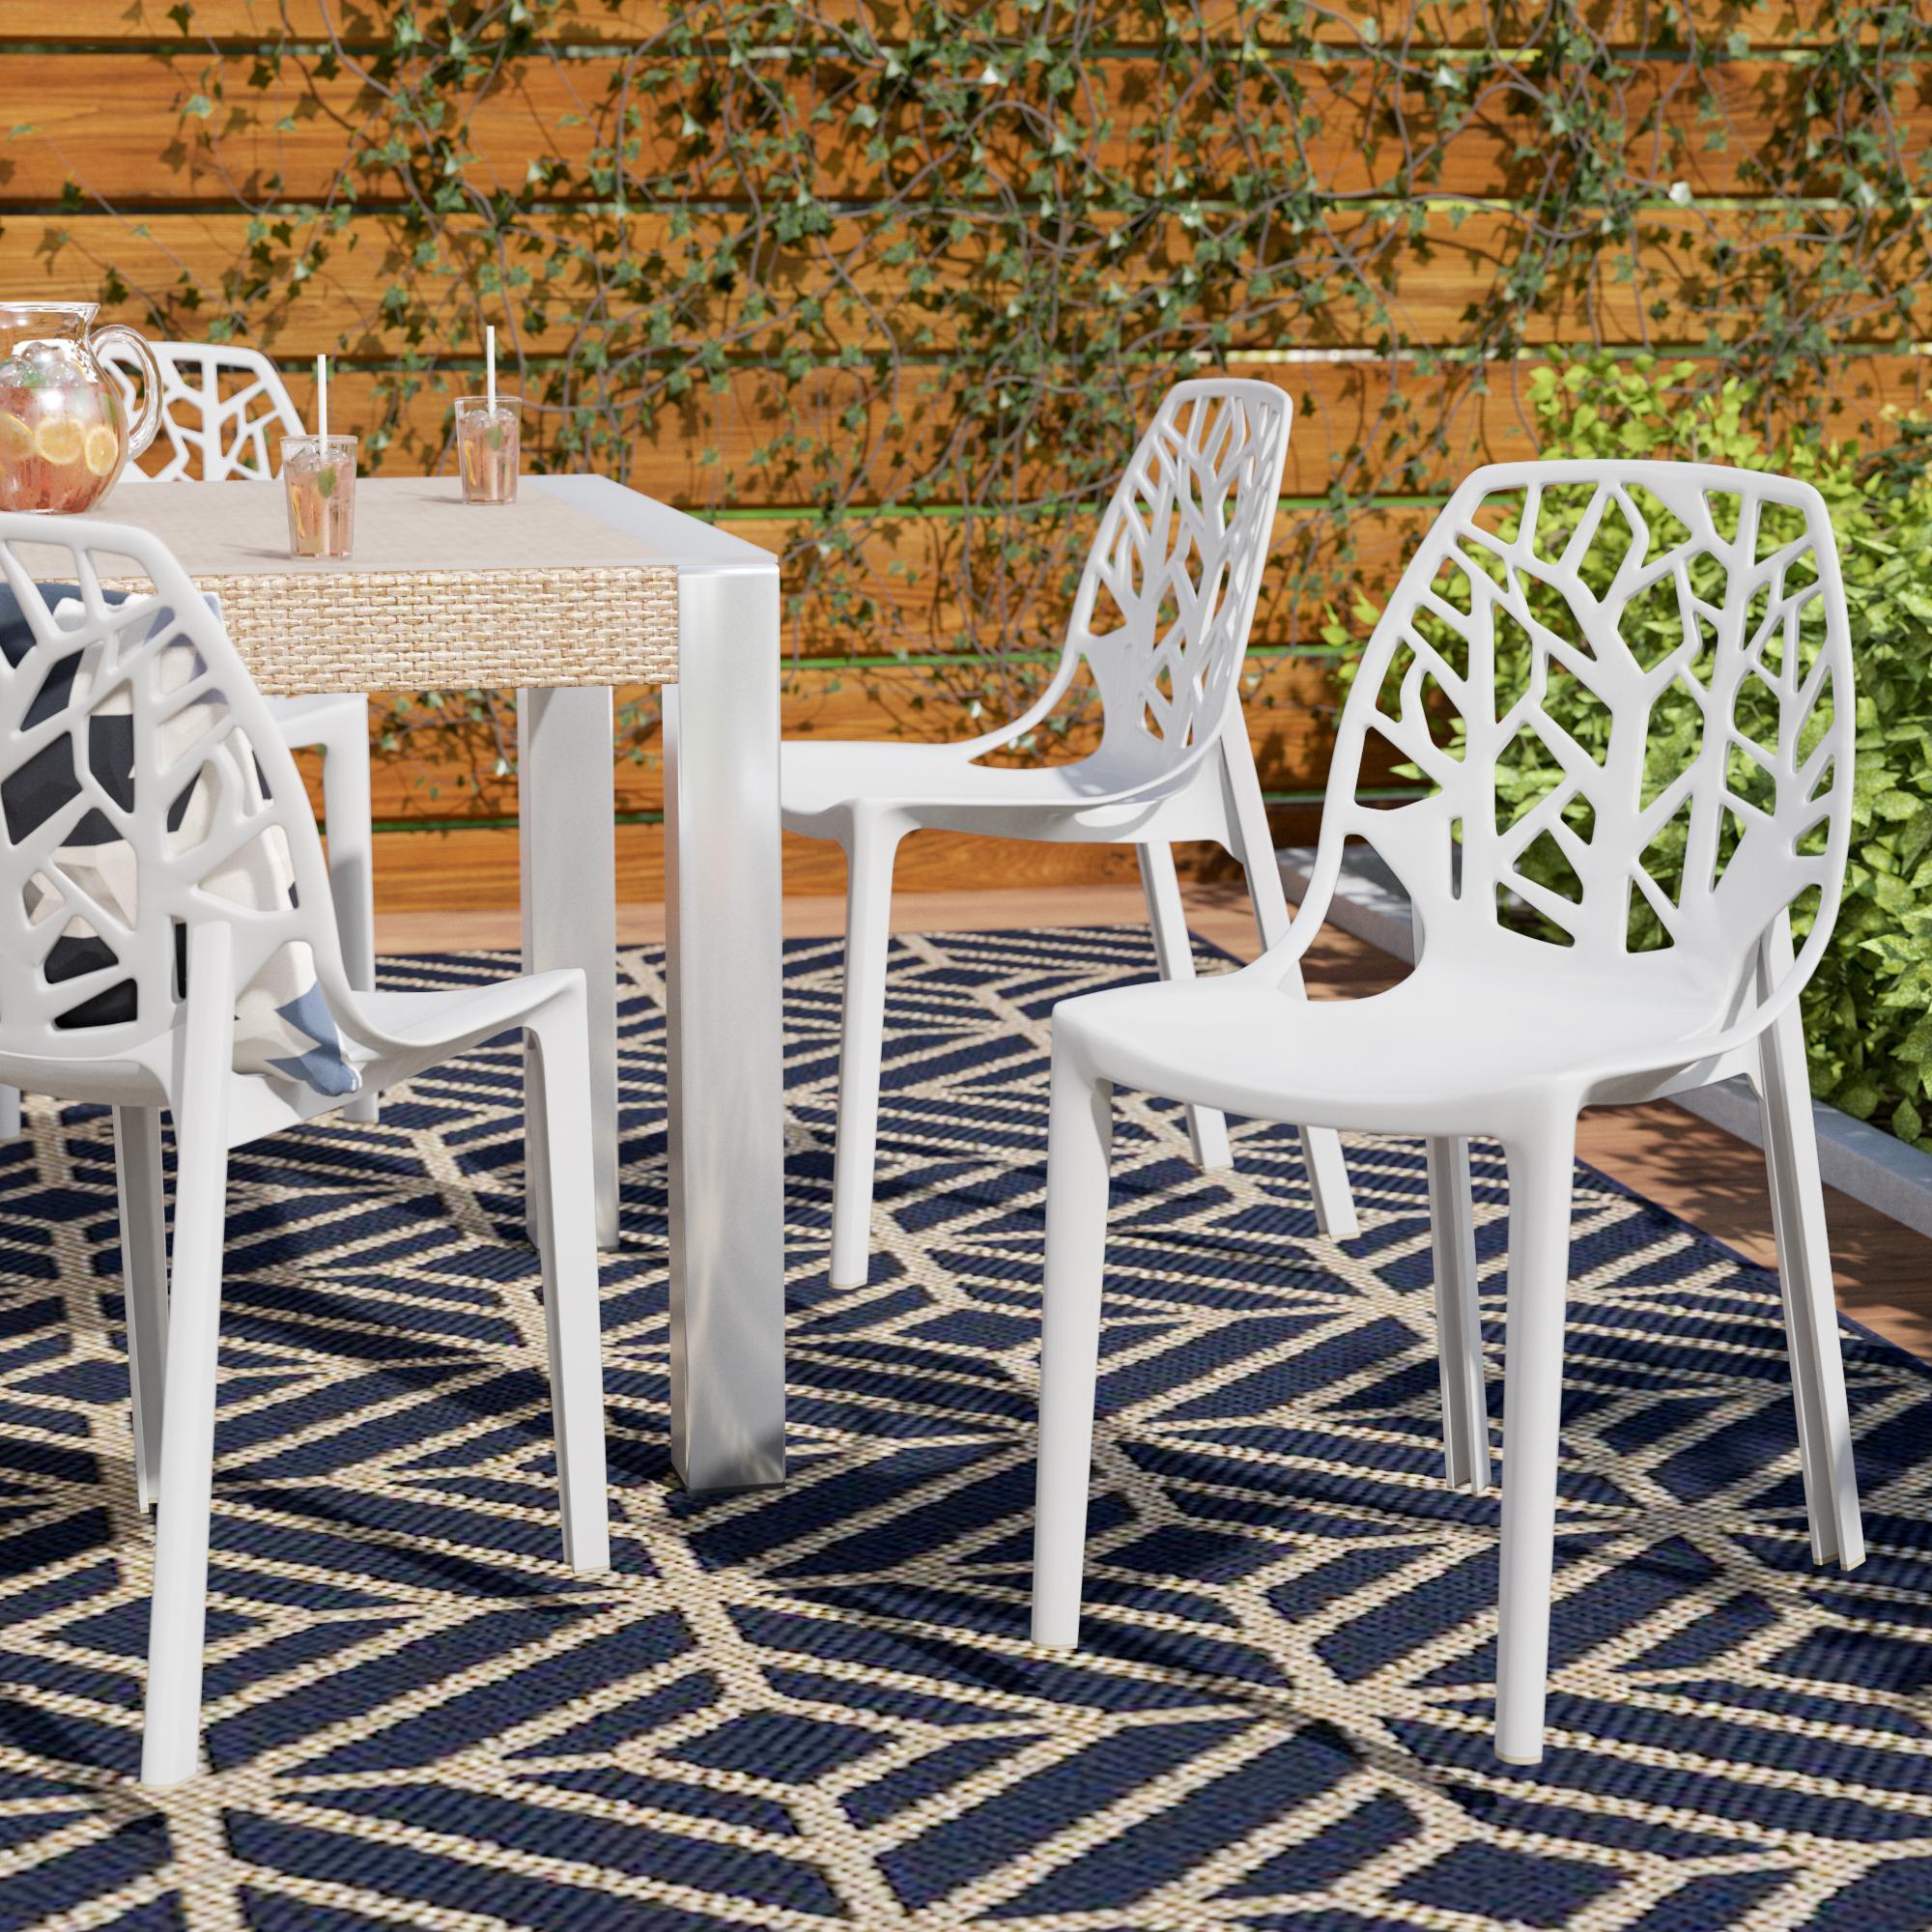 Modern Plastic Outdoor Furniture | Allmodern In Outdoor Wicker Plastic Half Moon Leaf Shape Porch Swings (View 18 of 25)